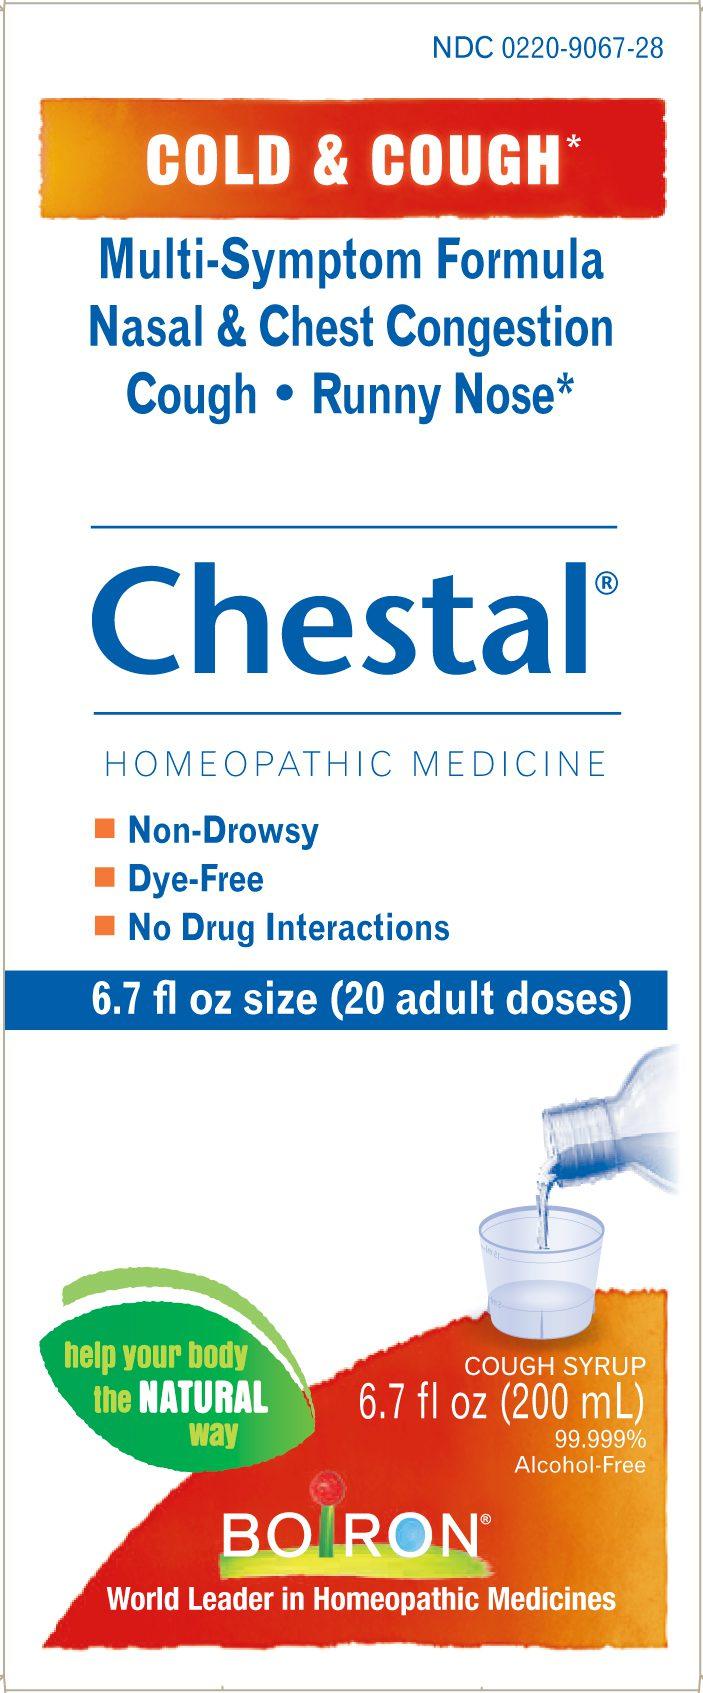 Homeopathy Boiron Kimberton Whole Foods